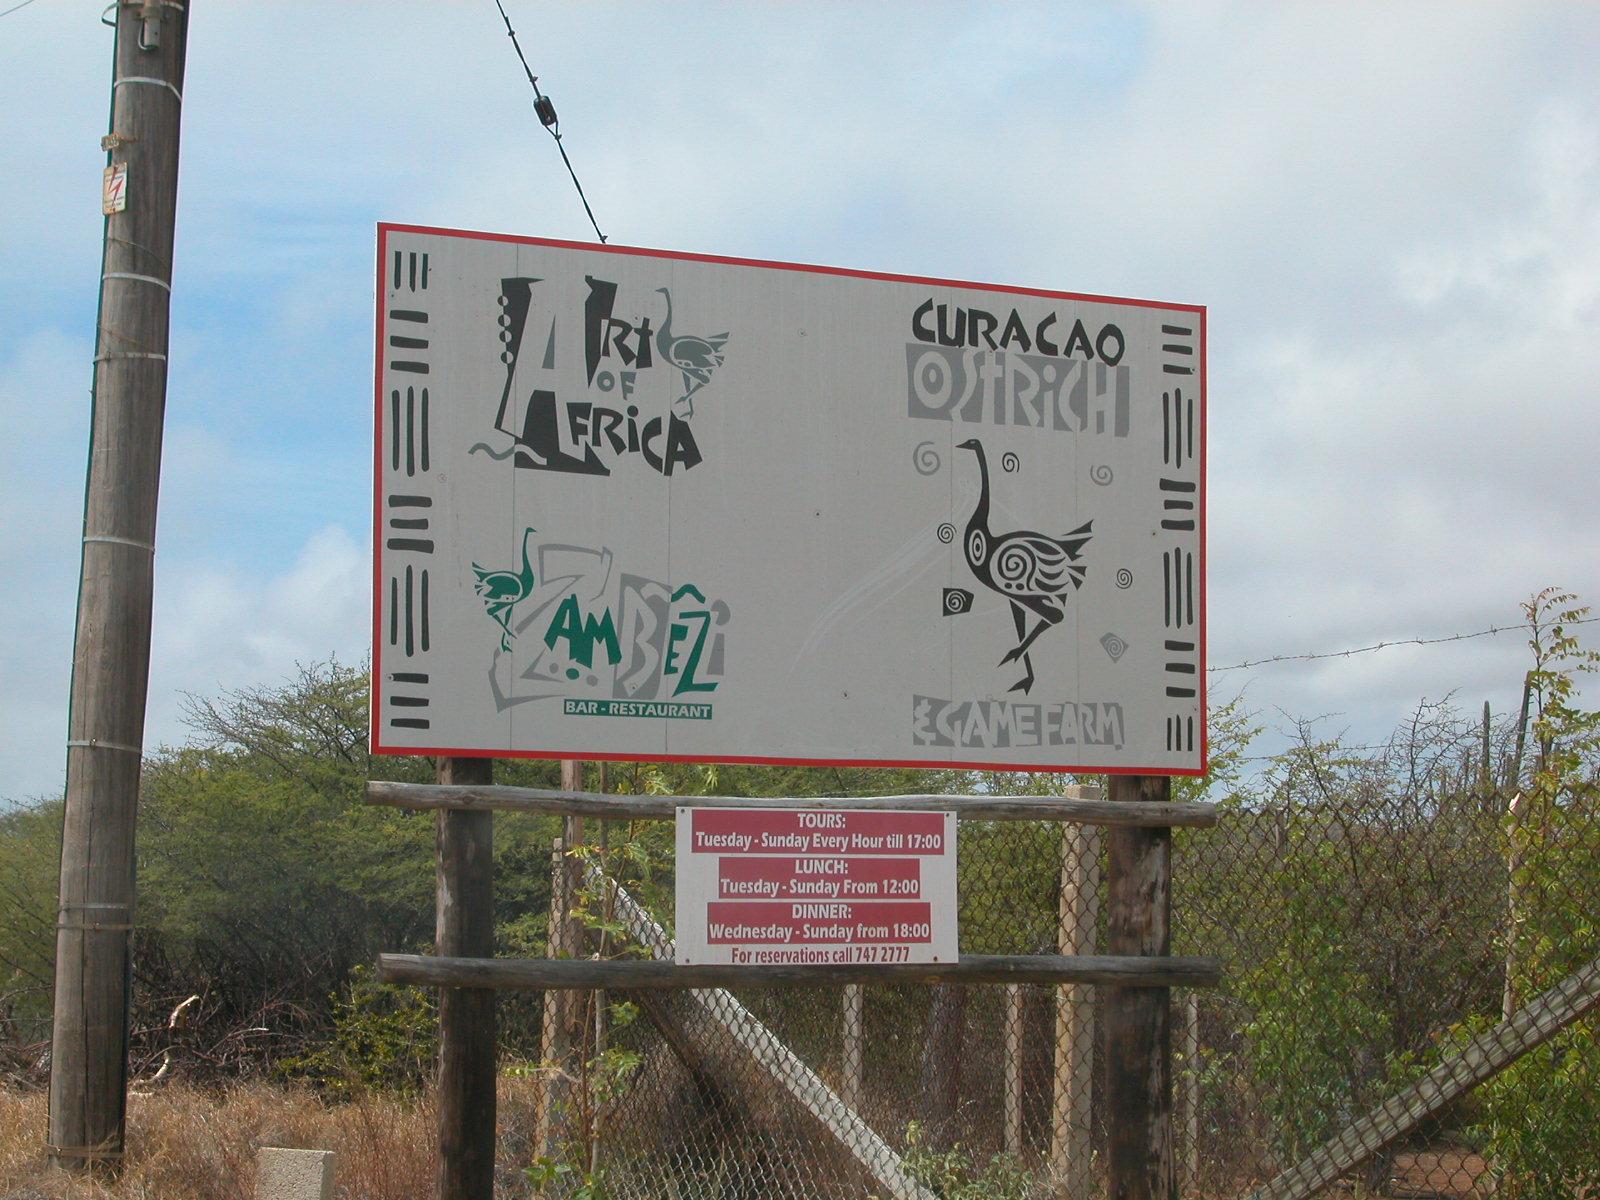 jacco curacao objects signs brand logo brands logos ostrich africa art zambezi